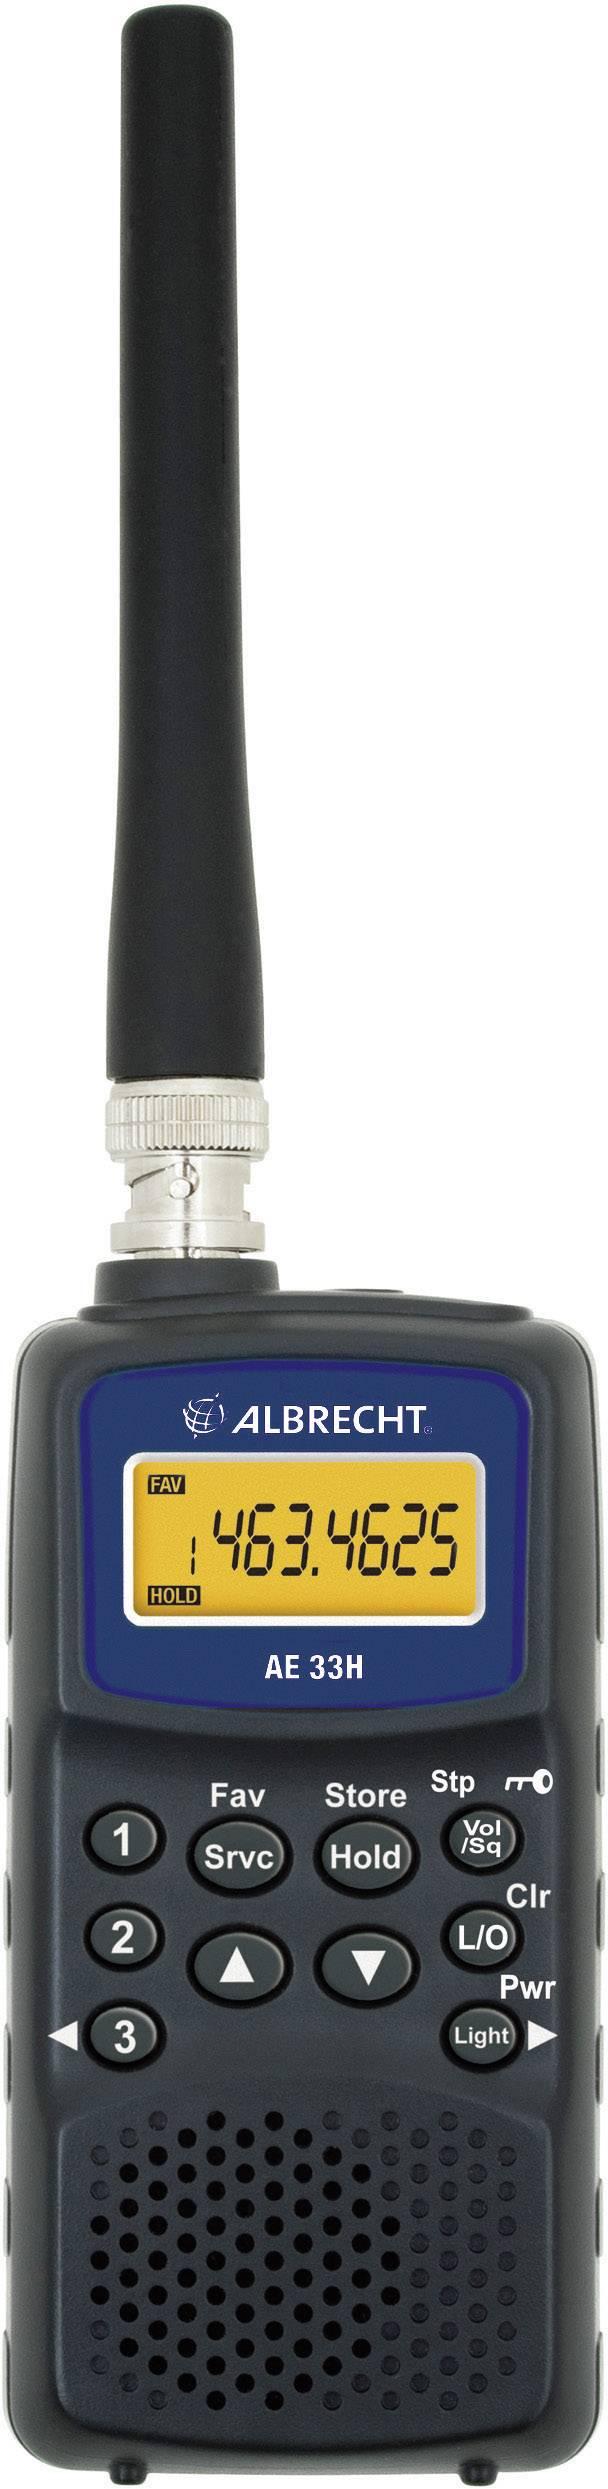 Rádiový ruční skener Albrecht AE 33 H